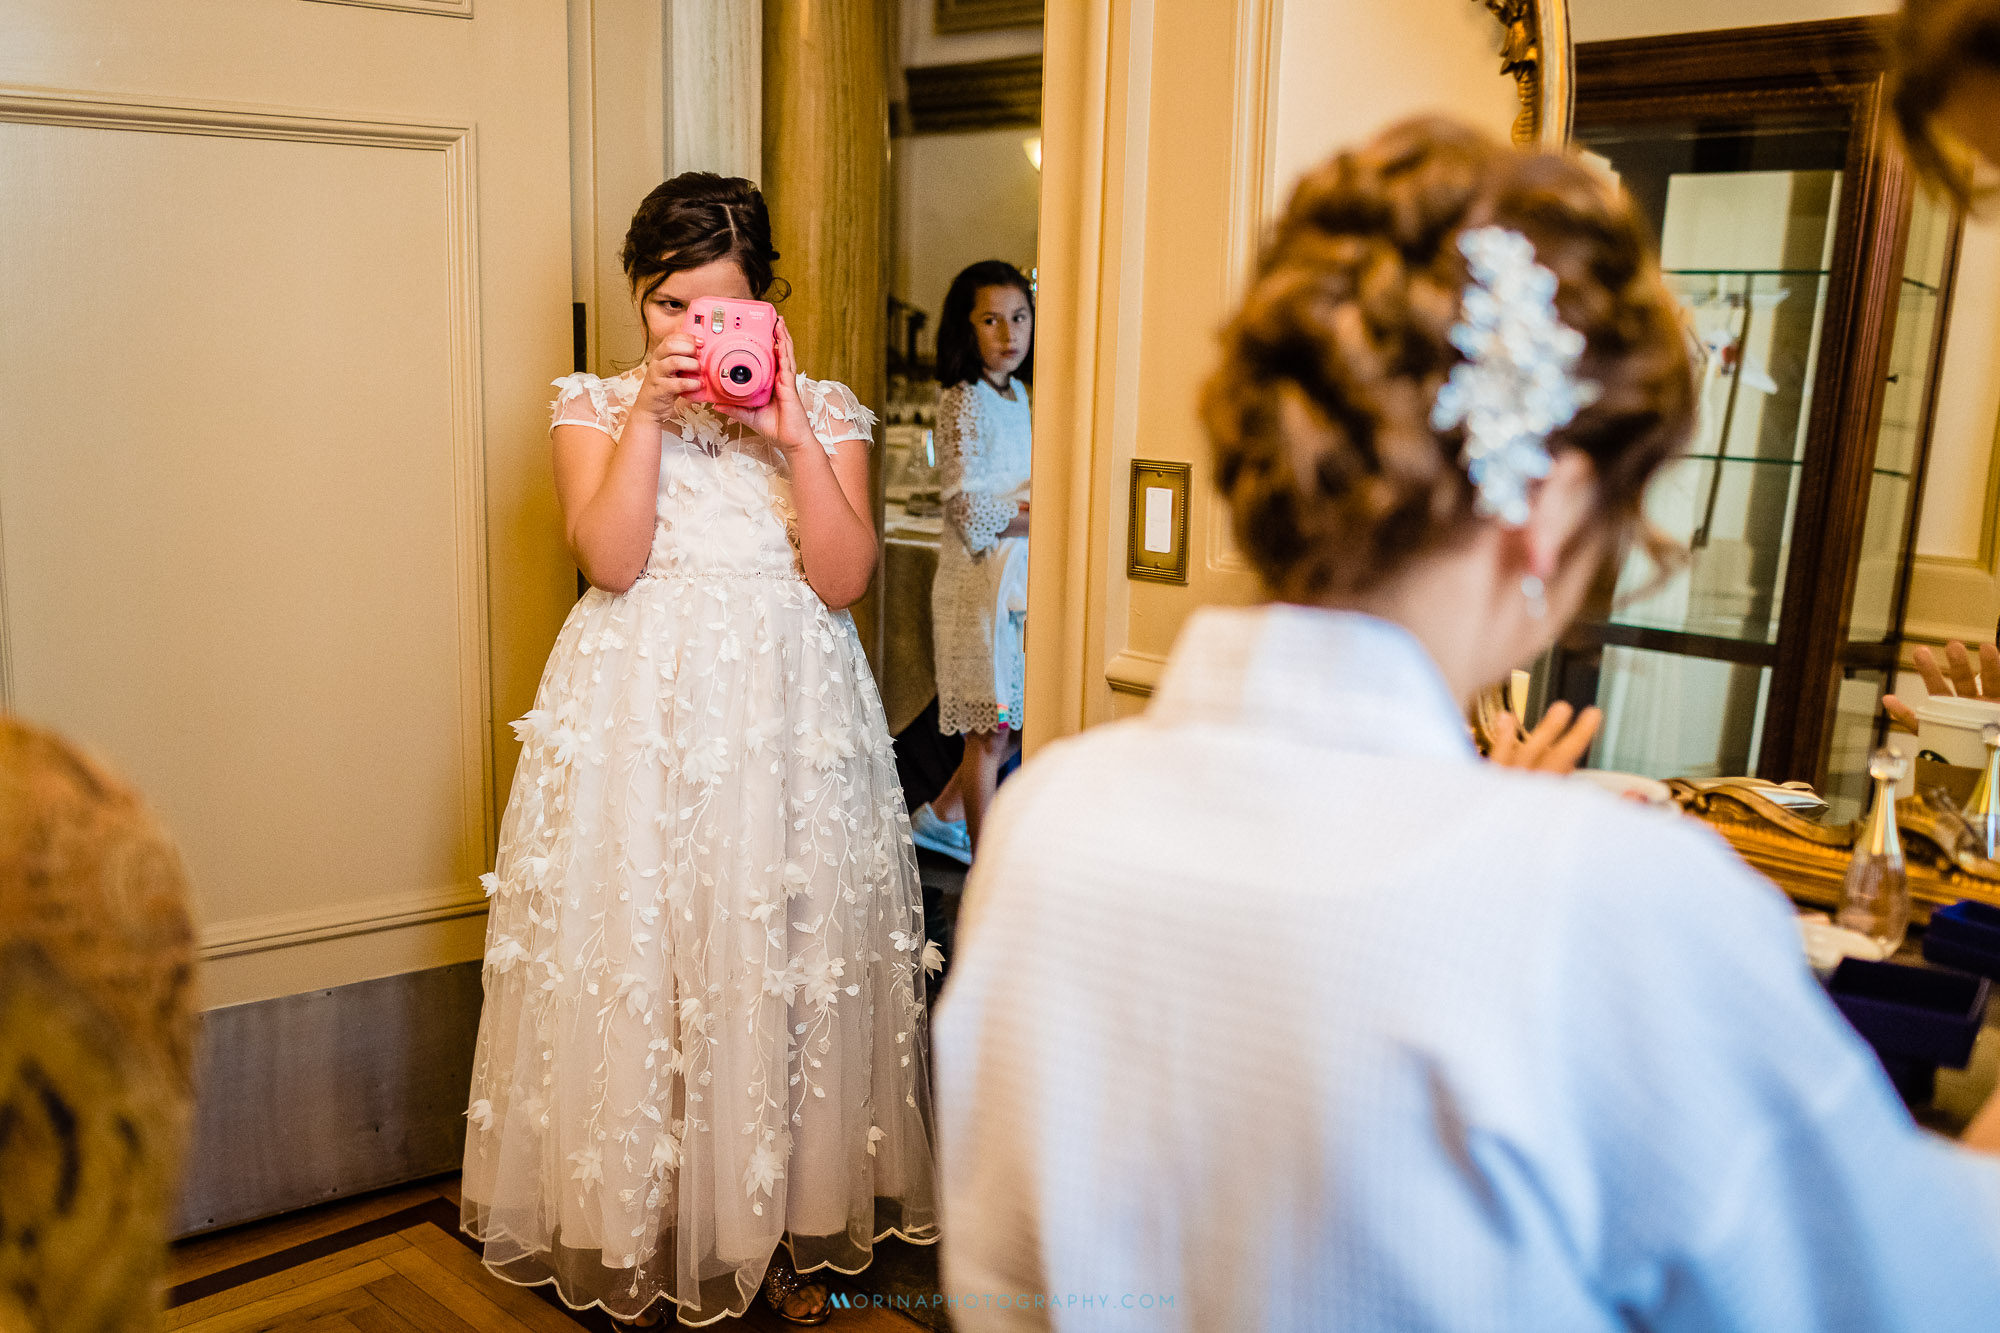 Ilhana & Jonathan Wedding at Vault 634 - Allentown 0006.jpg